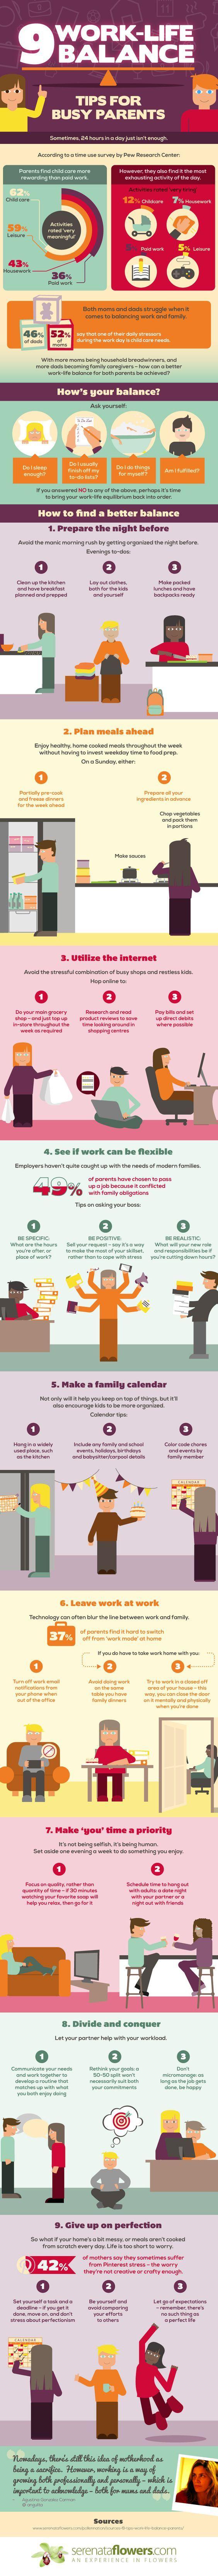 366 best Parenting Advice images on Pinterest